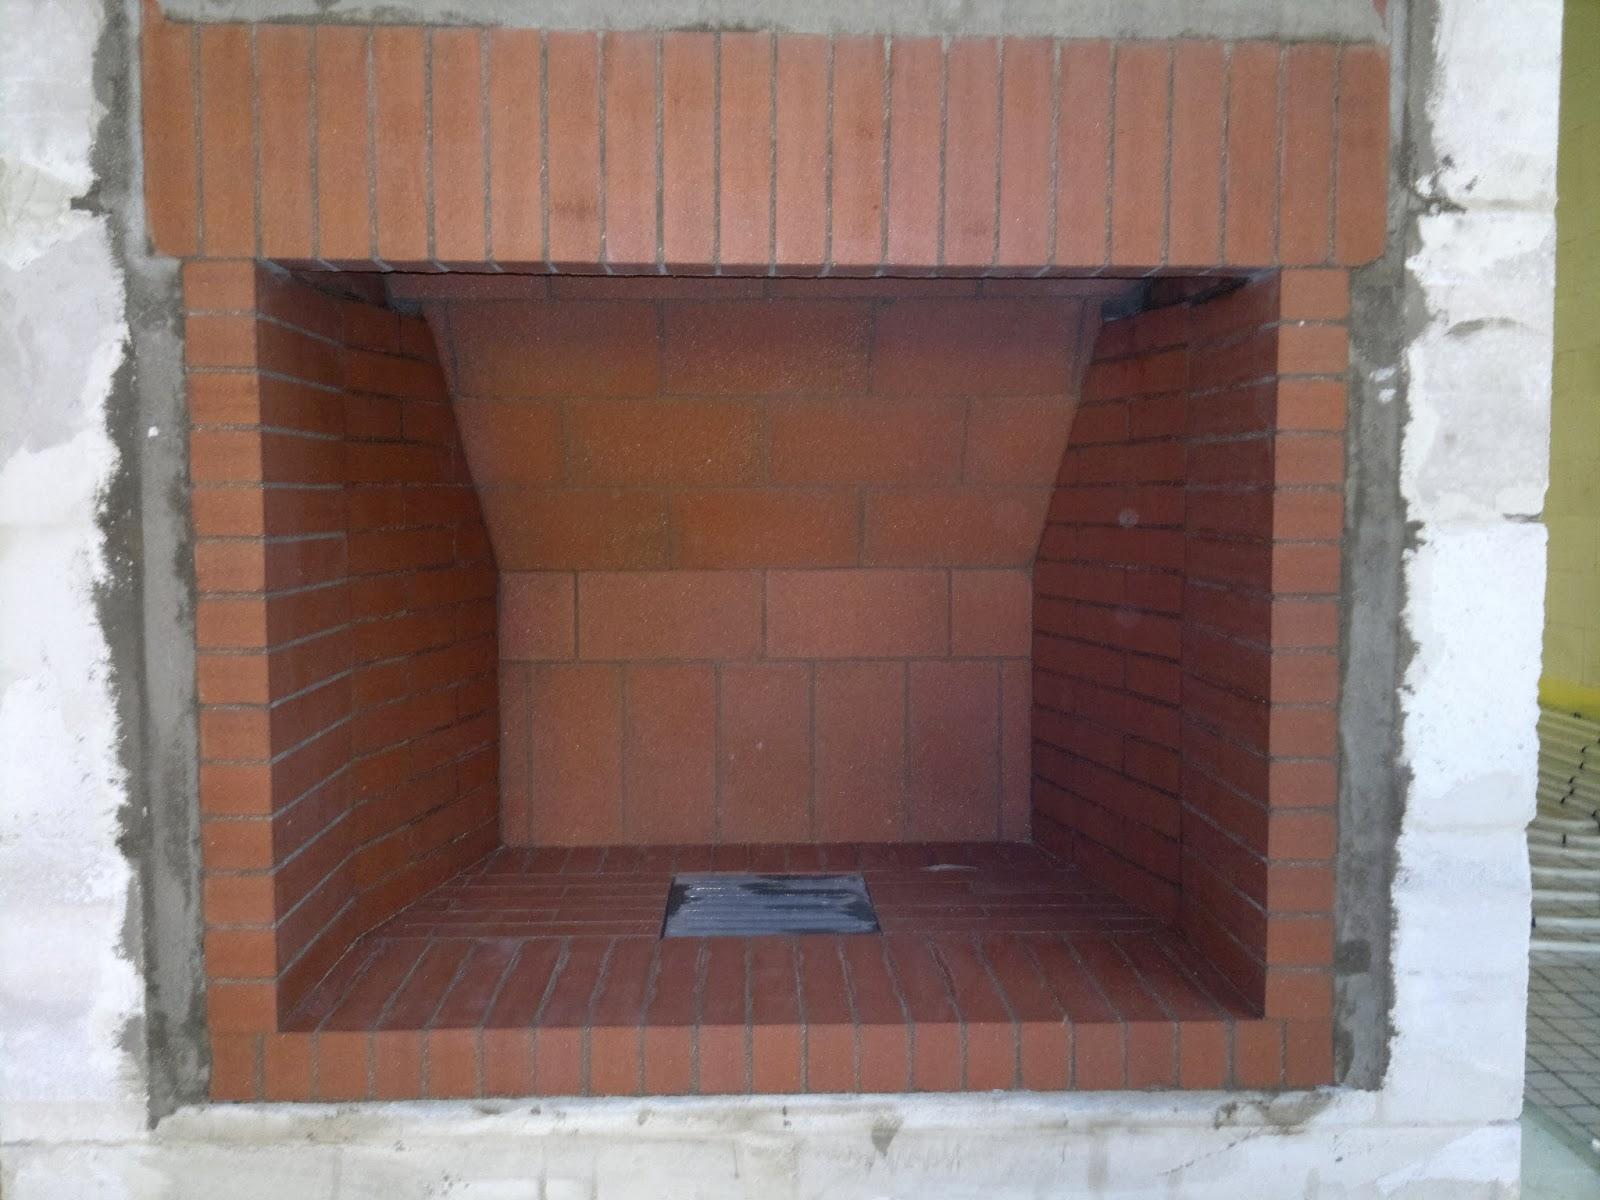 Elbląg kominki-palenisko otwarte